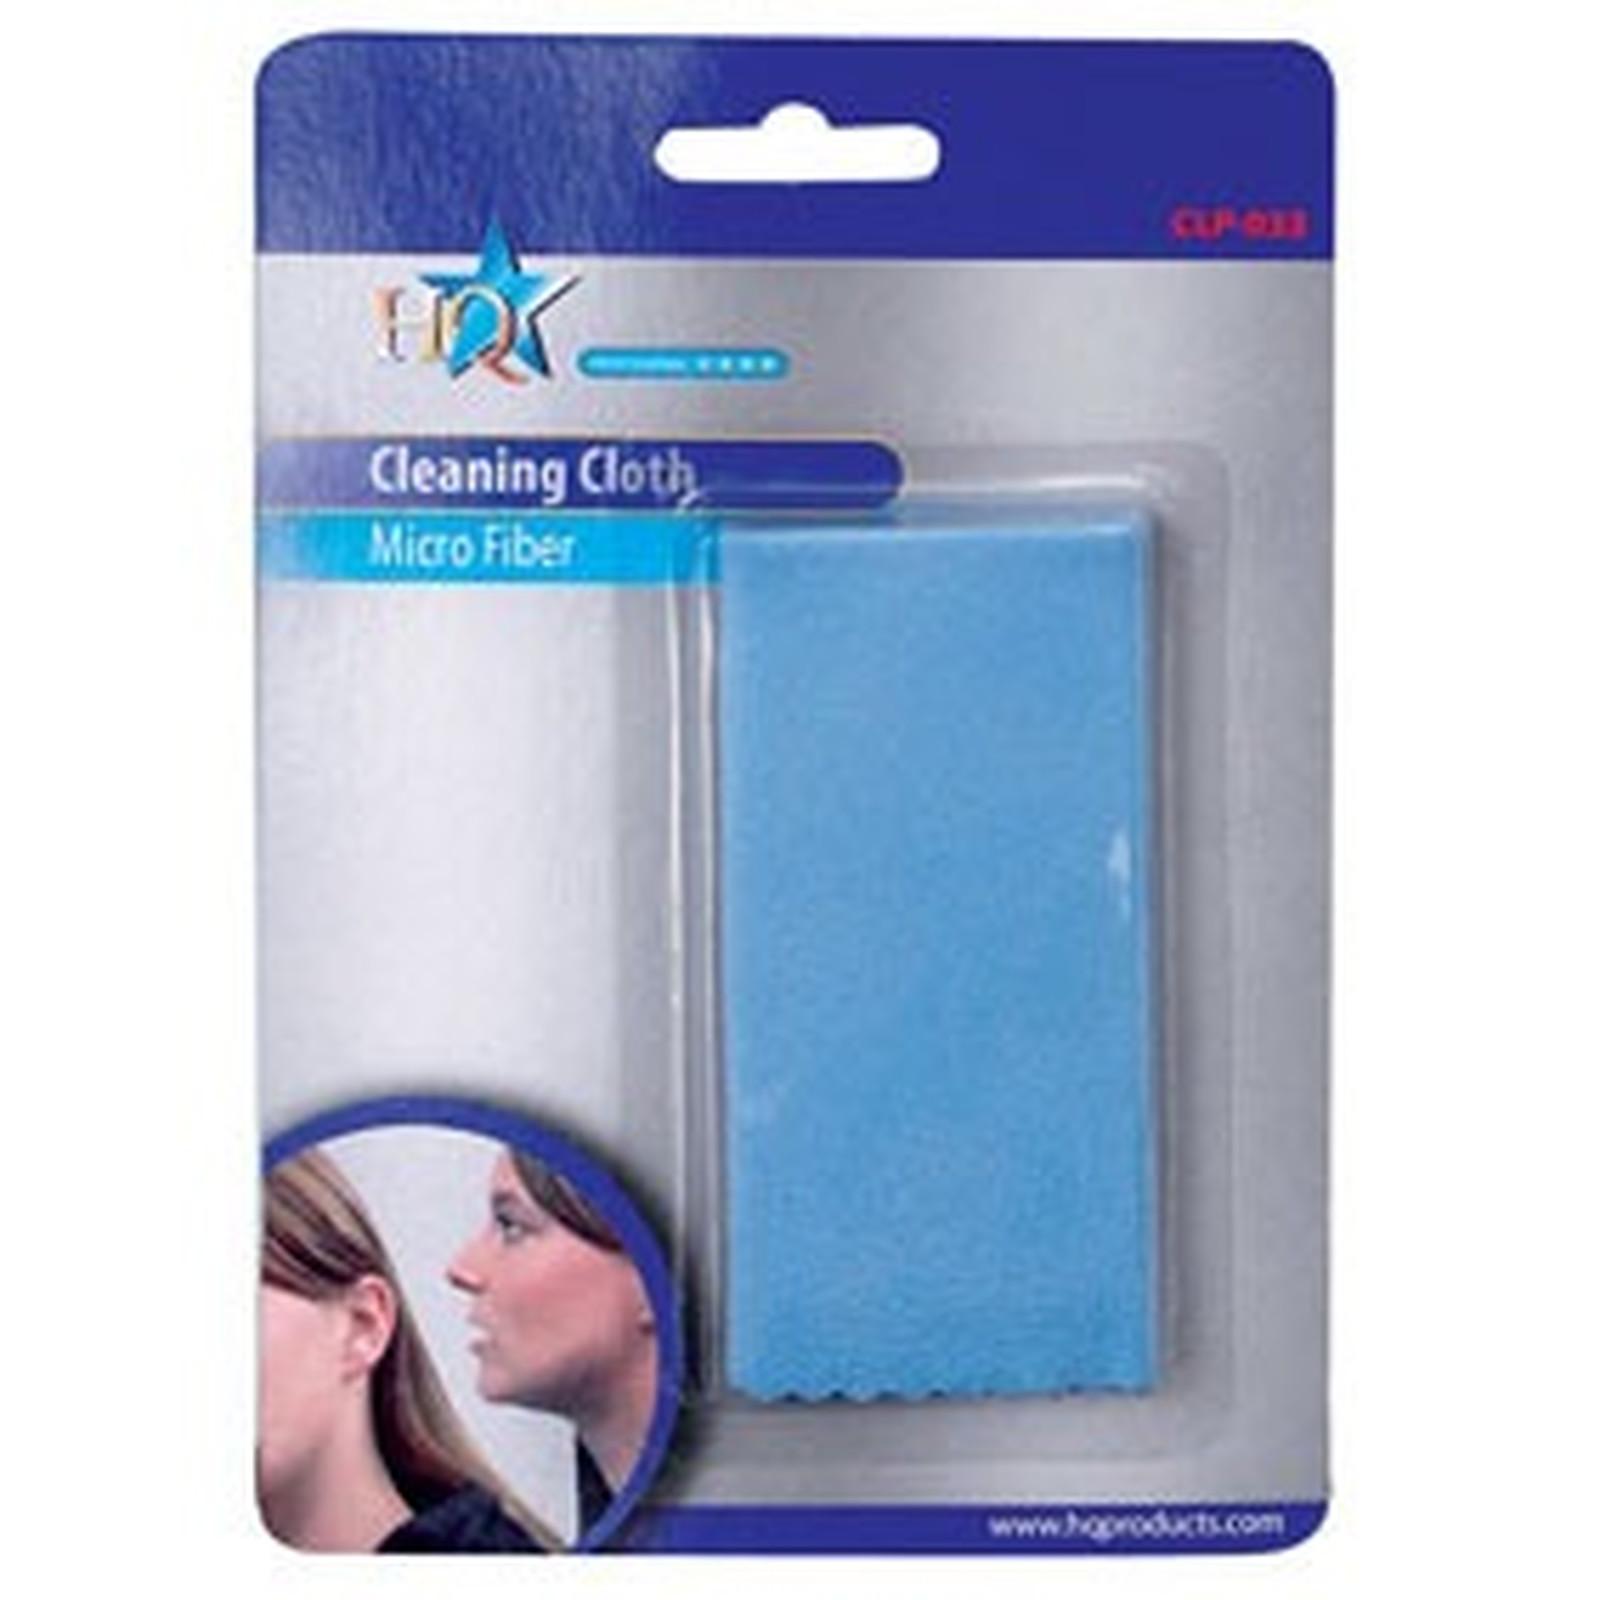 Tissu de nettoyage doux